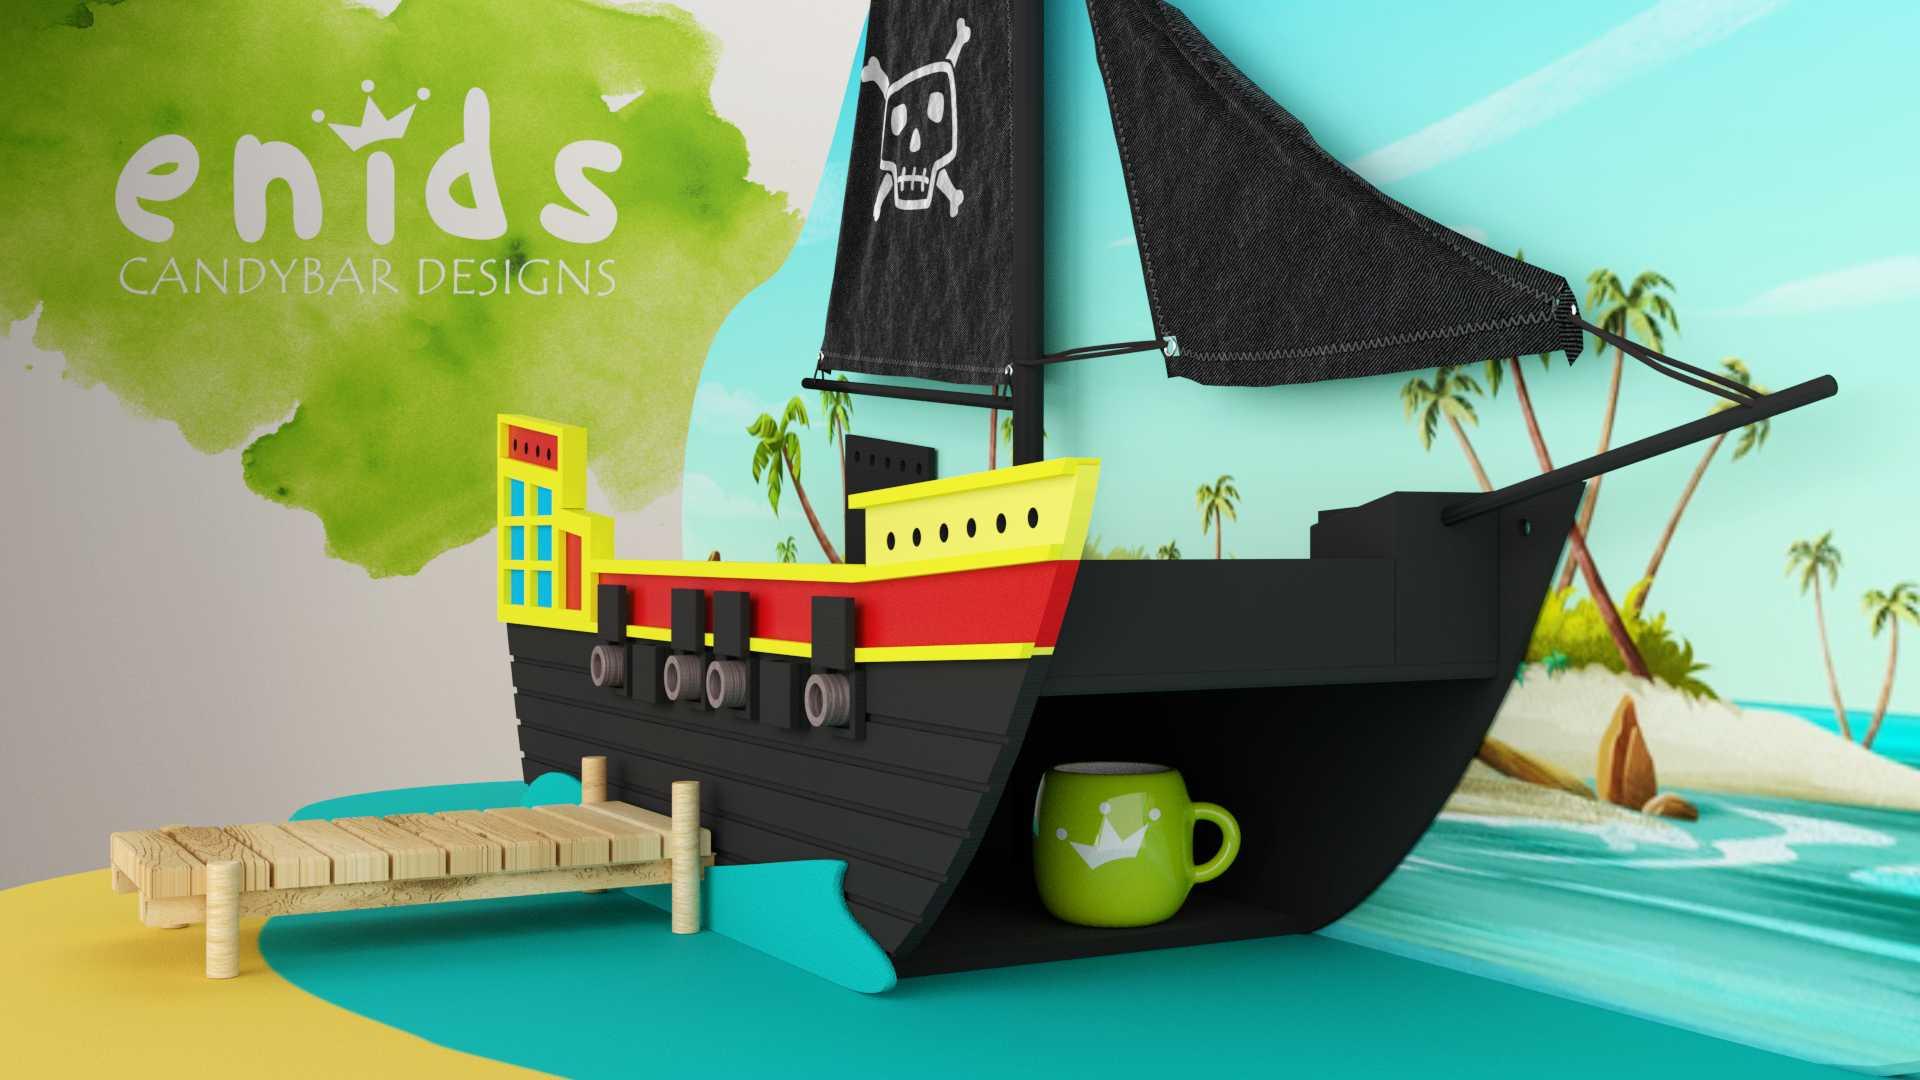 Model Pirateninsel Deko Vista 2